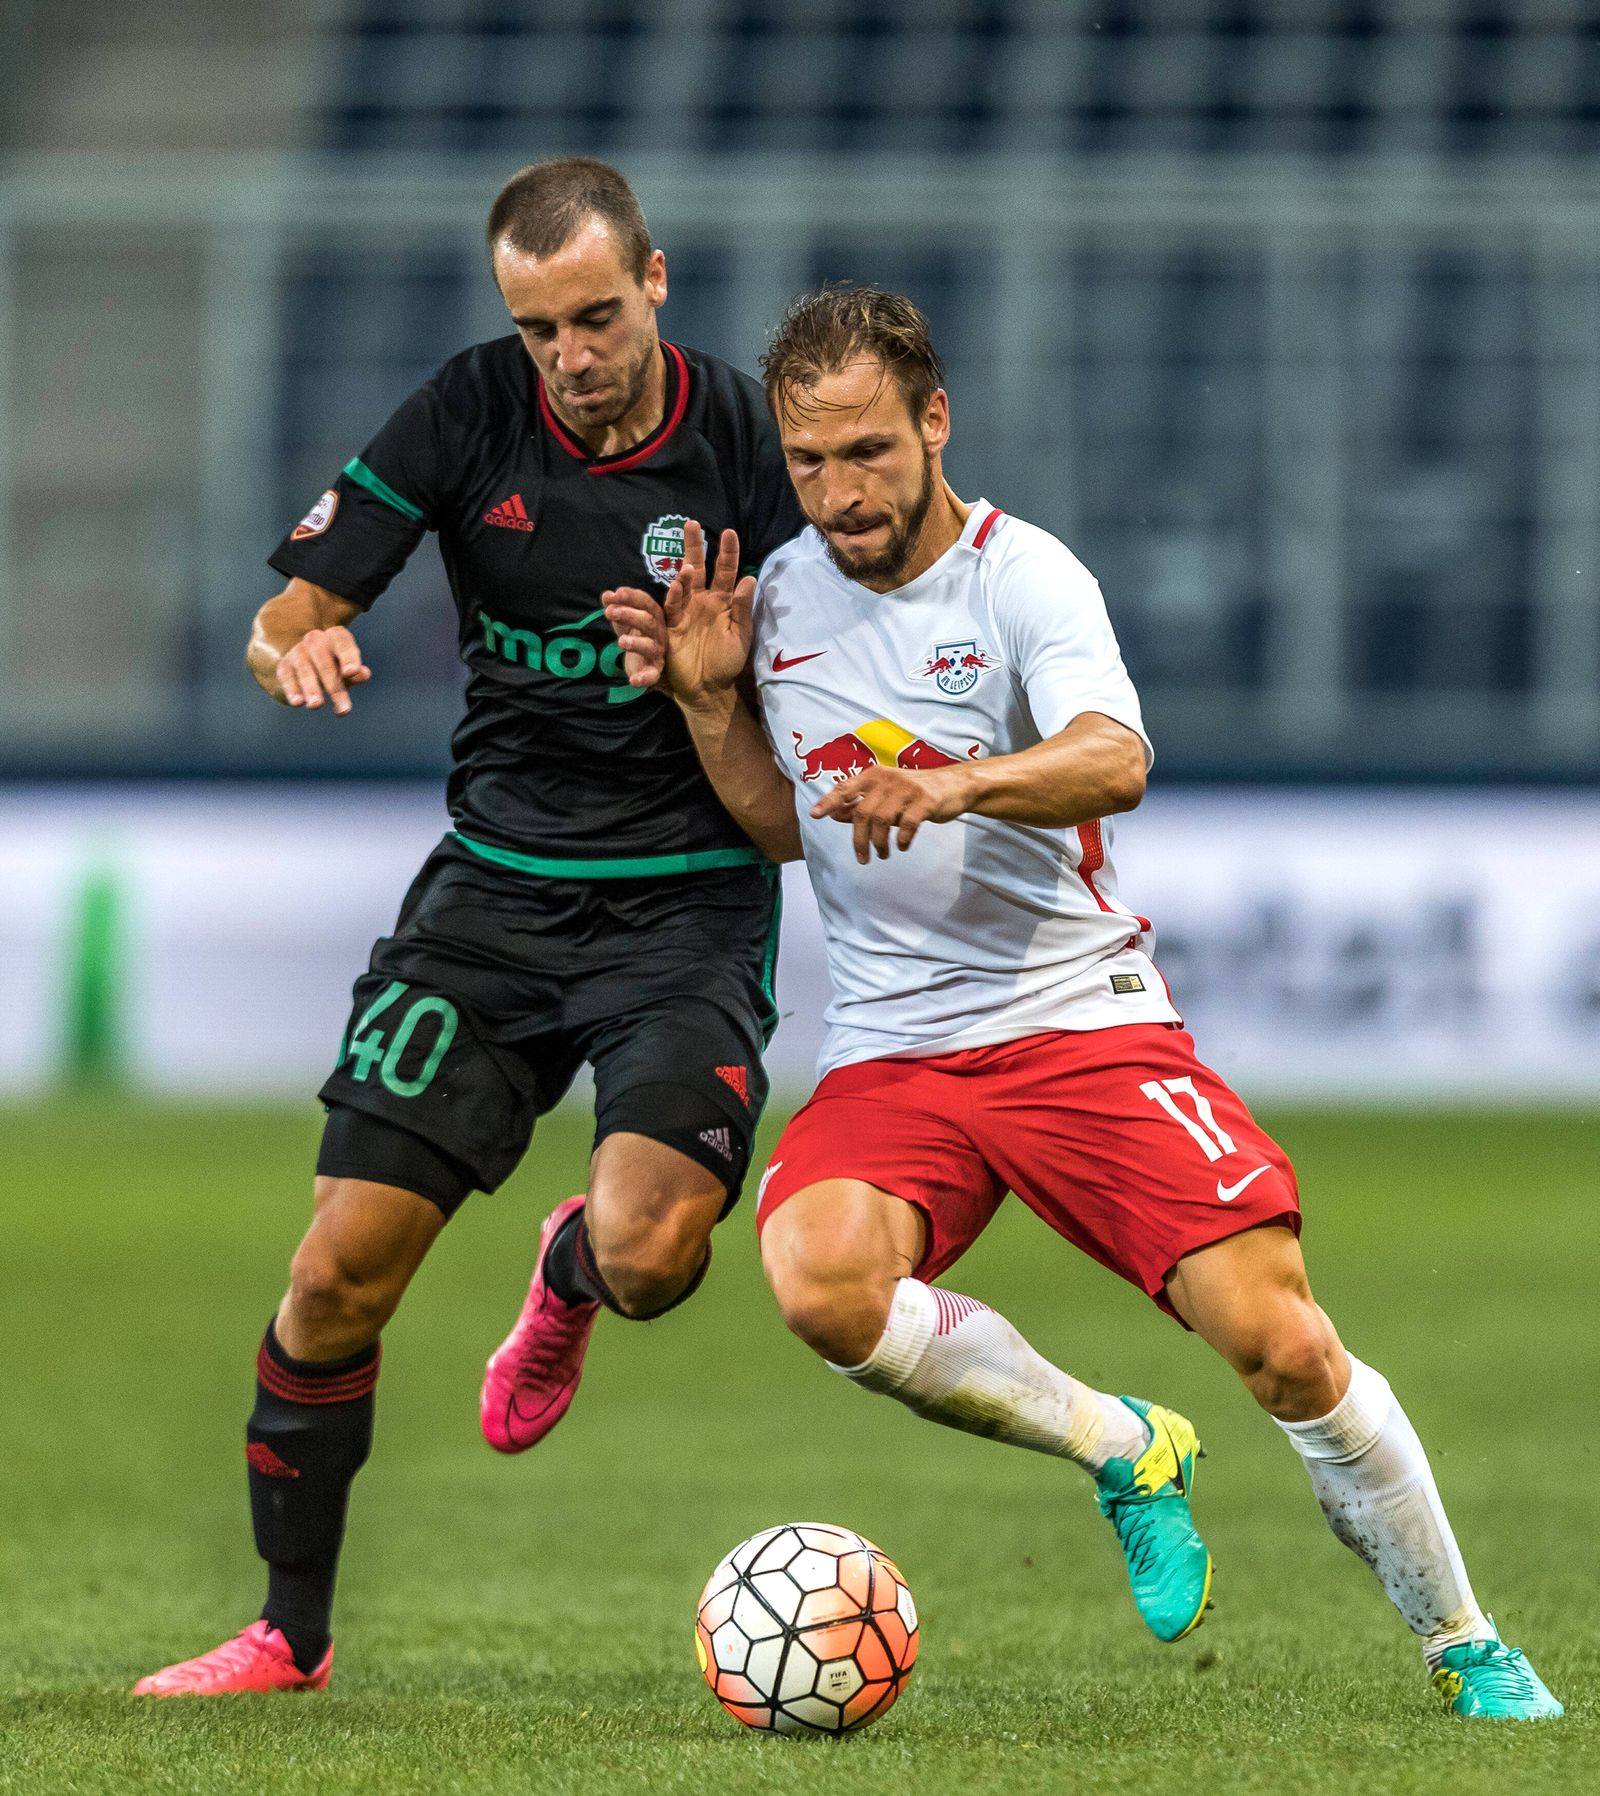 EINMALIGE VERWENDUNG Fussball CL/ RB Salzburg vs FK Liepaja/ Andreas Ulmer mit Leipzig Trikot